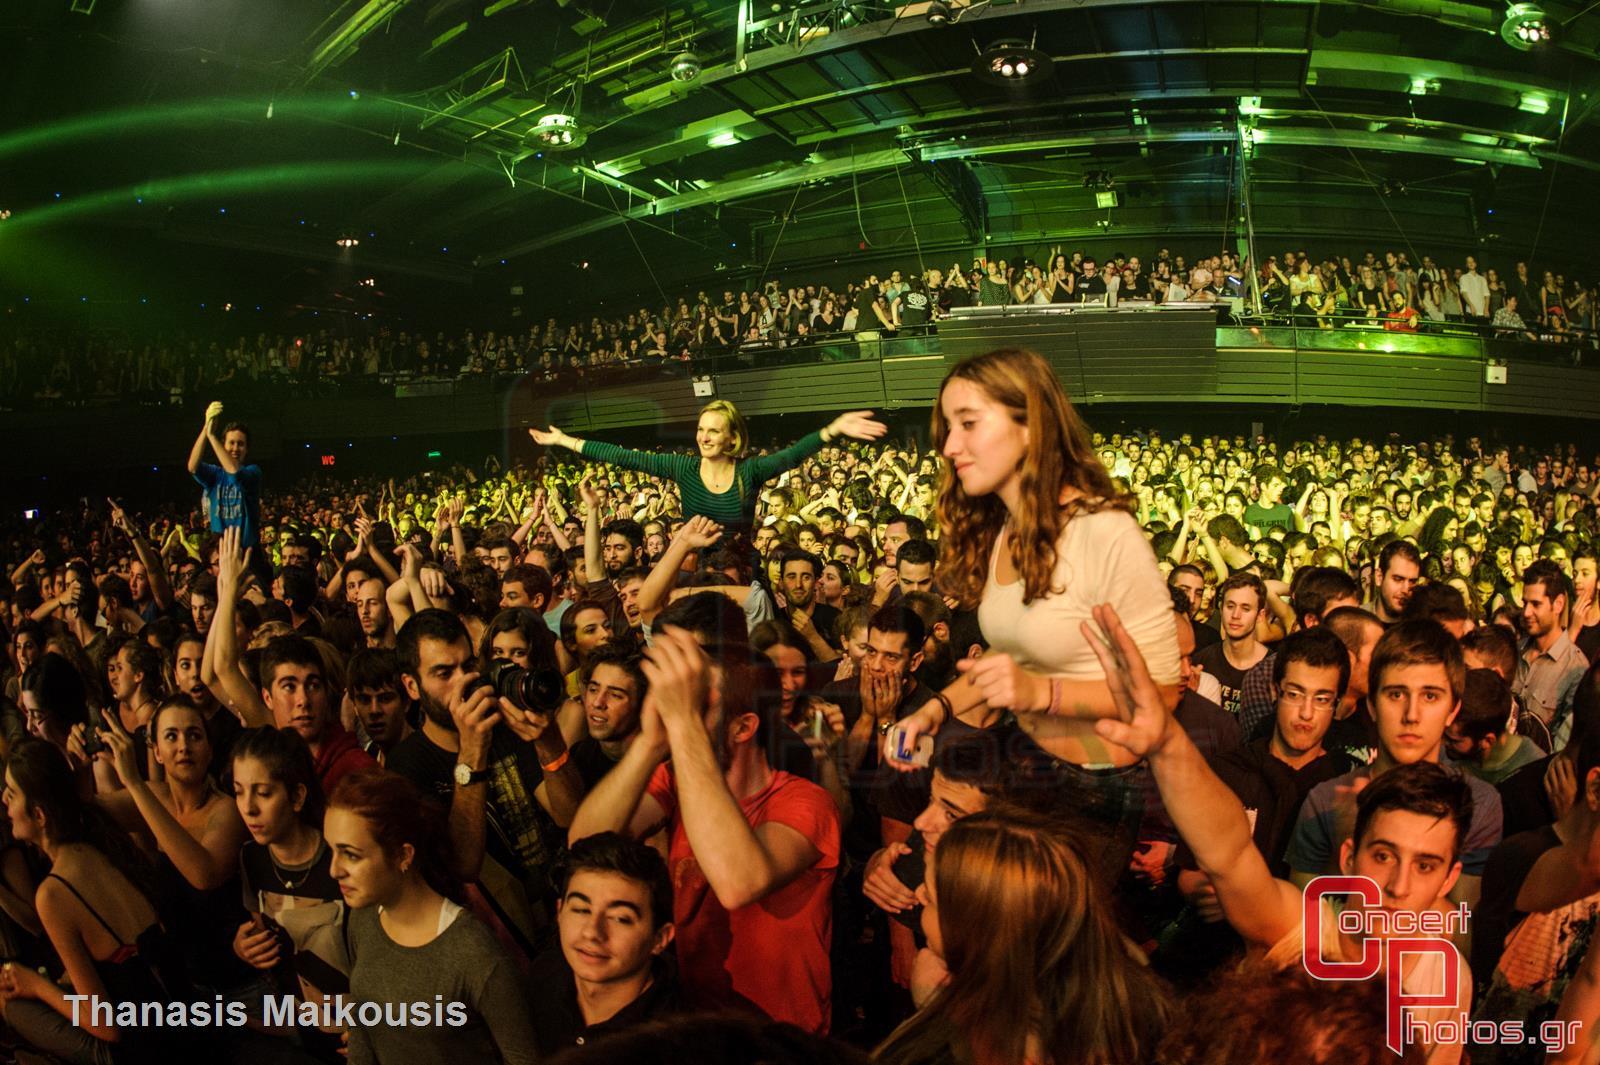 Gramatik-Gramatik Votanikos 2013 photographer: Thanasis Maikousis - ConcertPhotos-5810